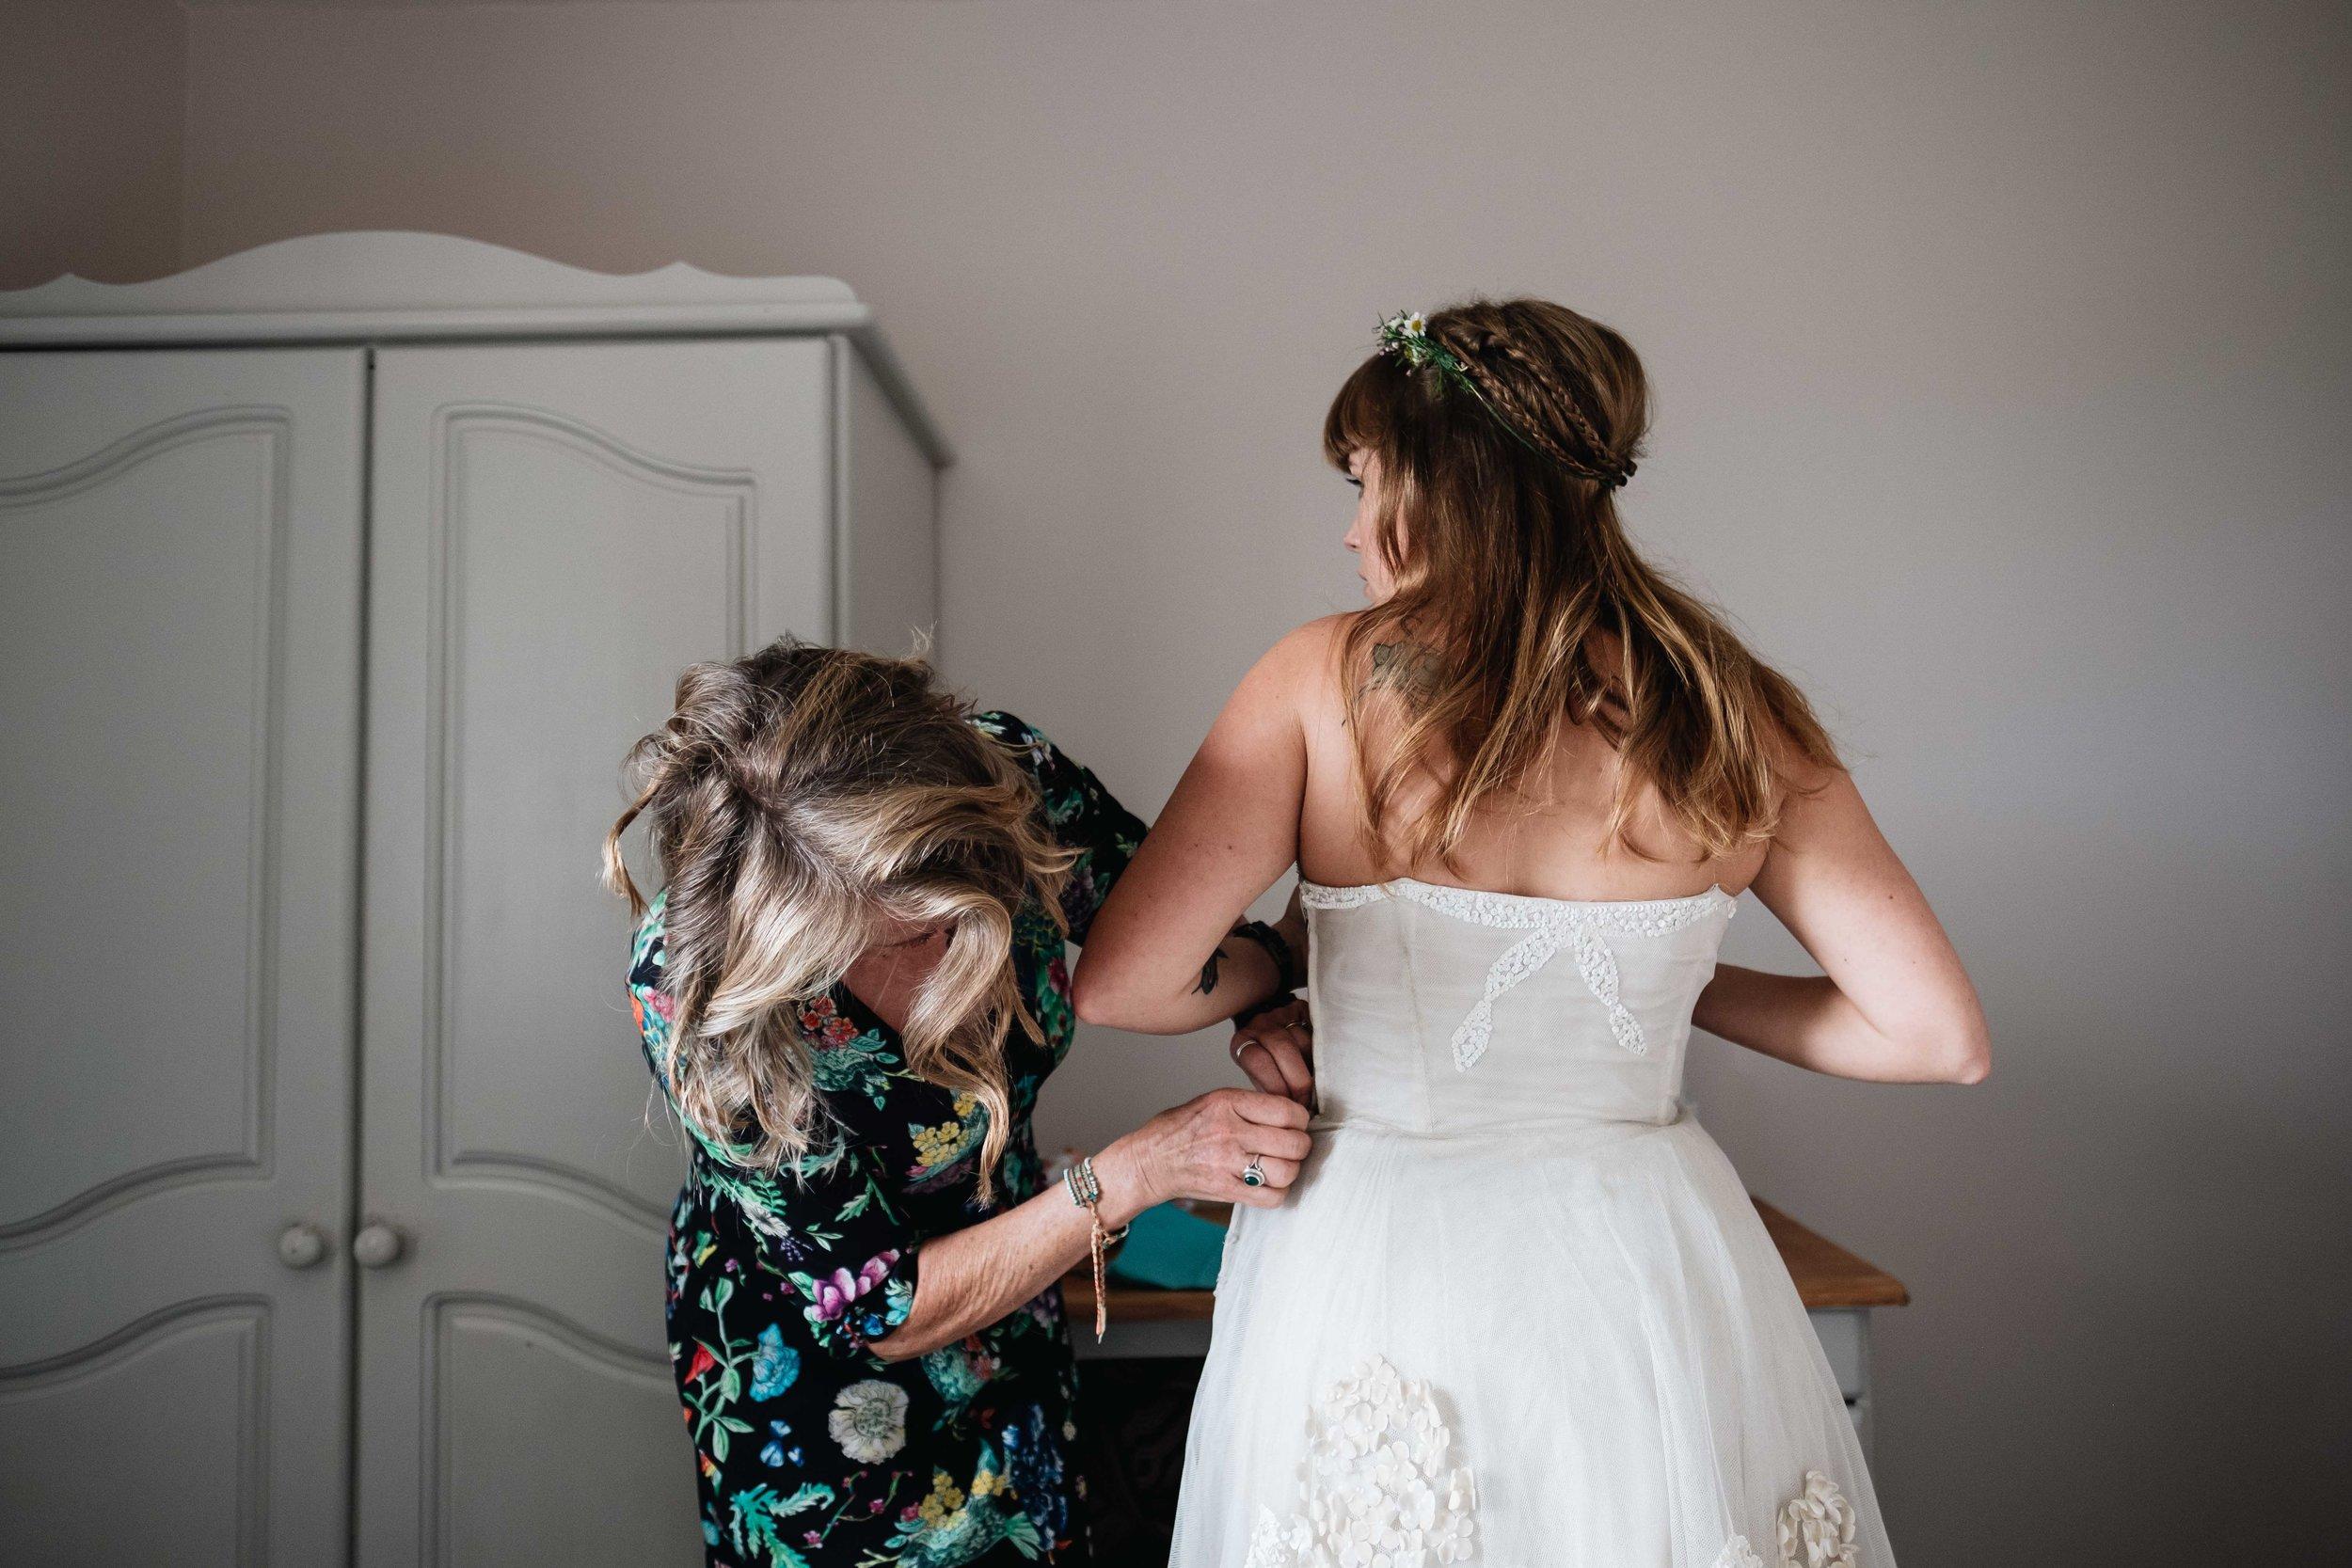 Mum helping bride get her dress on